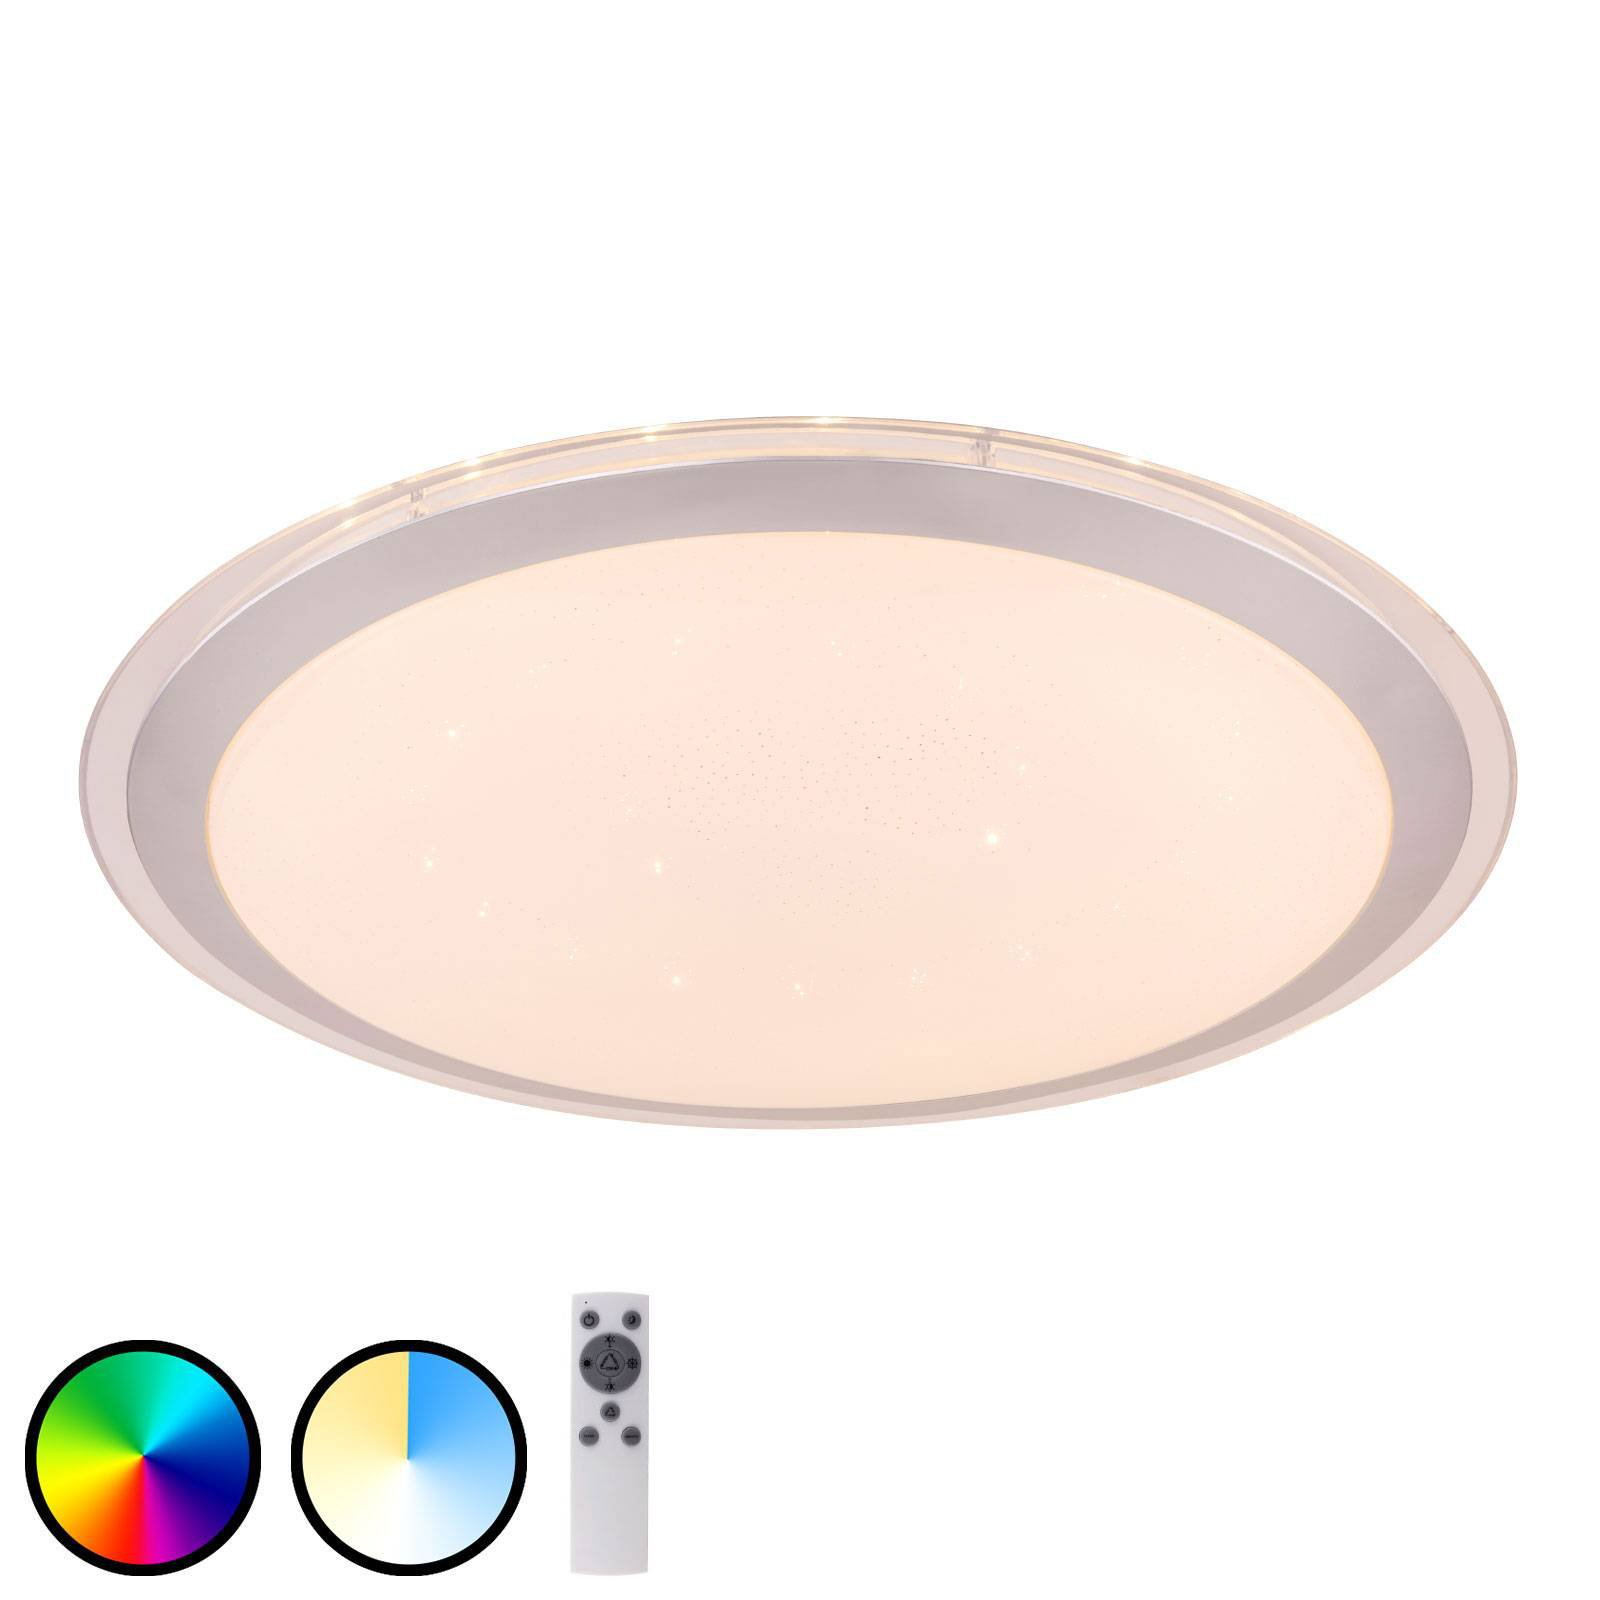 LED-taklampe Carry Tuya-Smart, RGBW CCT